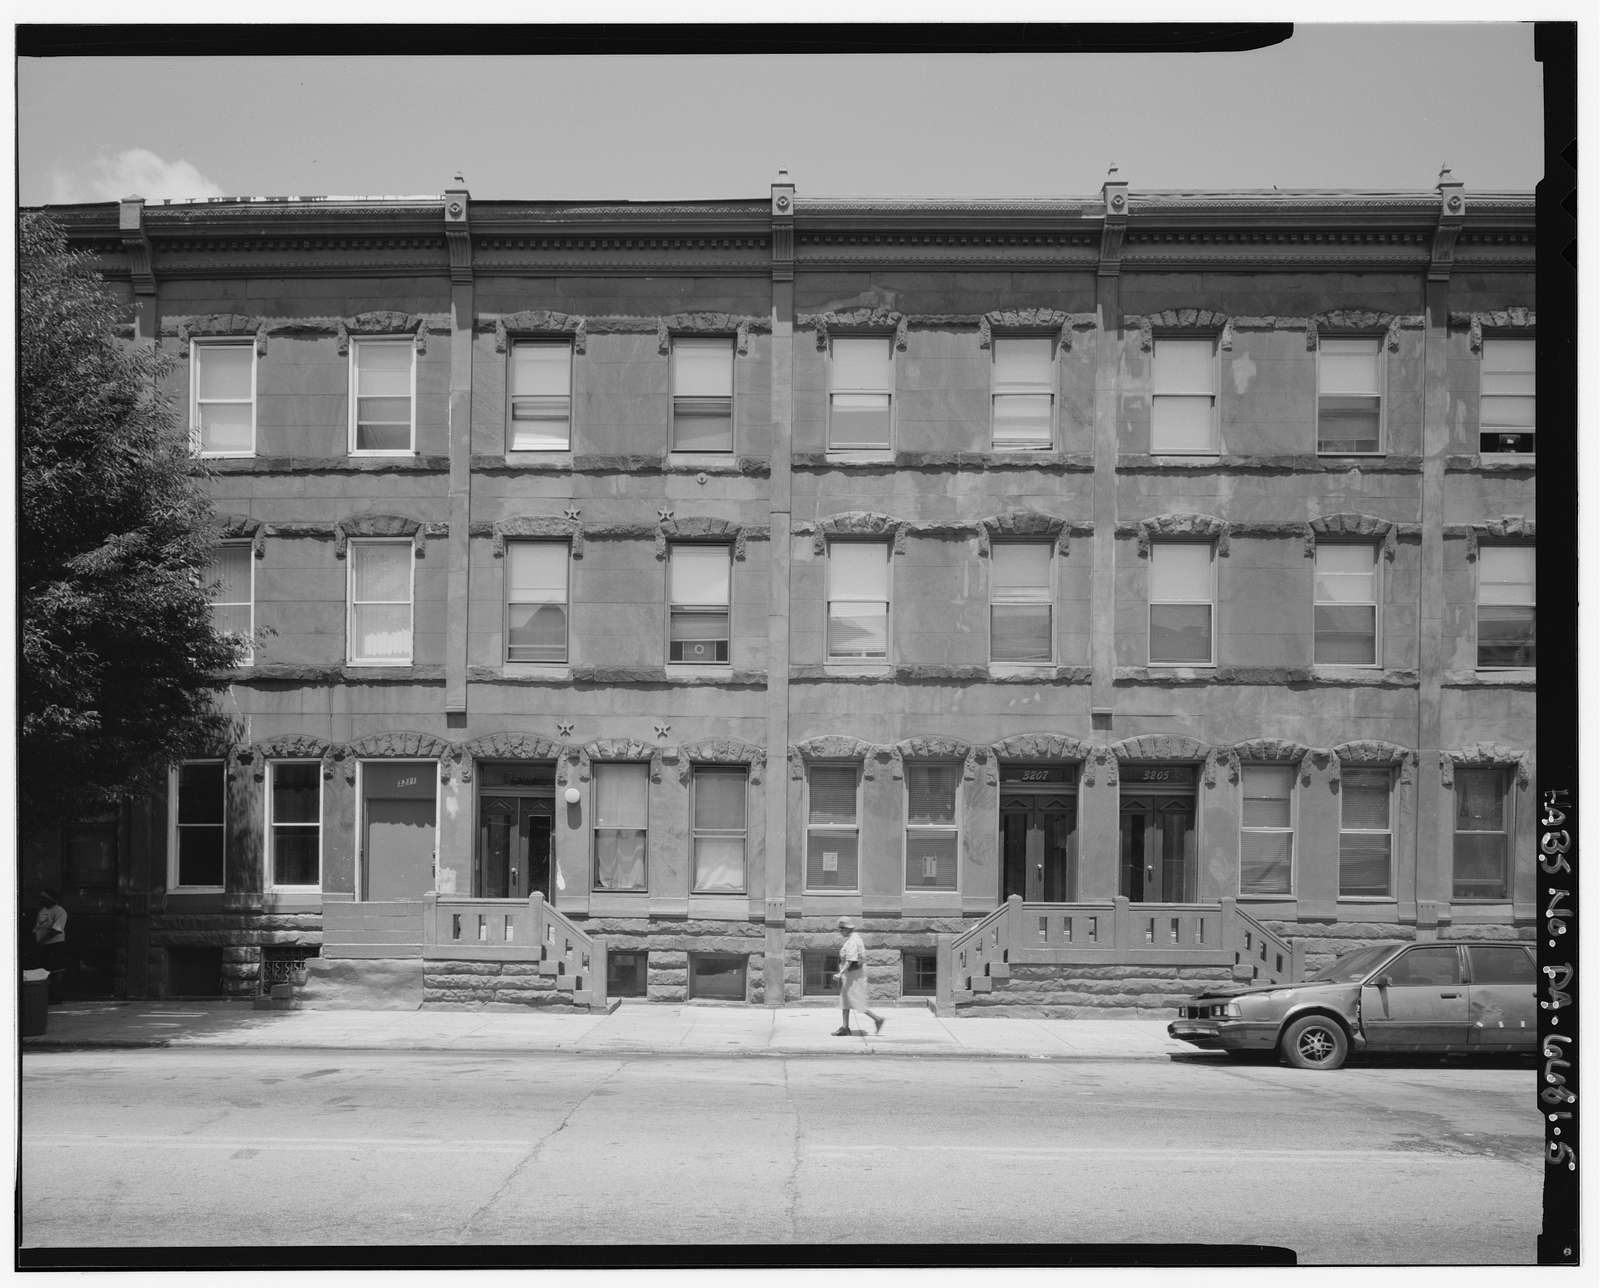 3200 Block Diamond Street (Houses & Storefront), North side, Philadelphia, Philadelphia County, PA